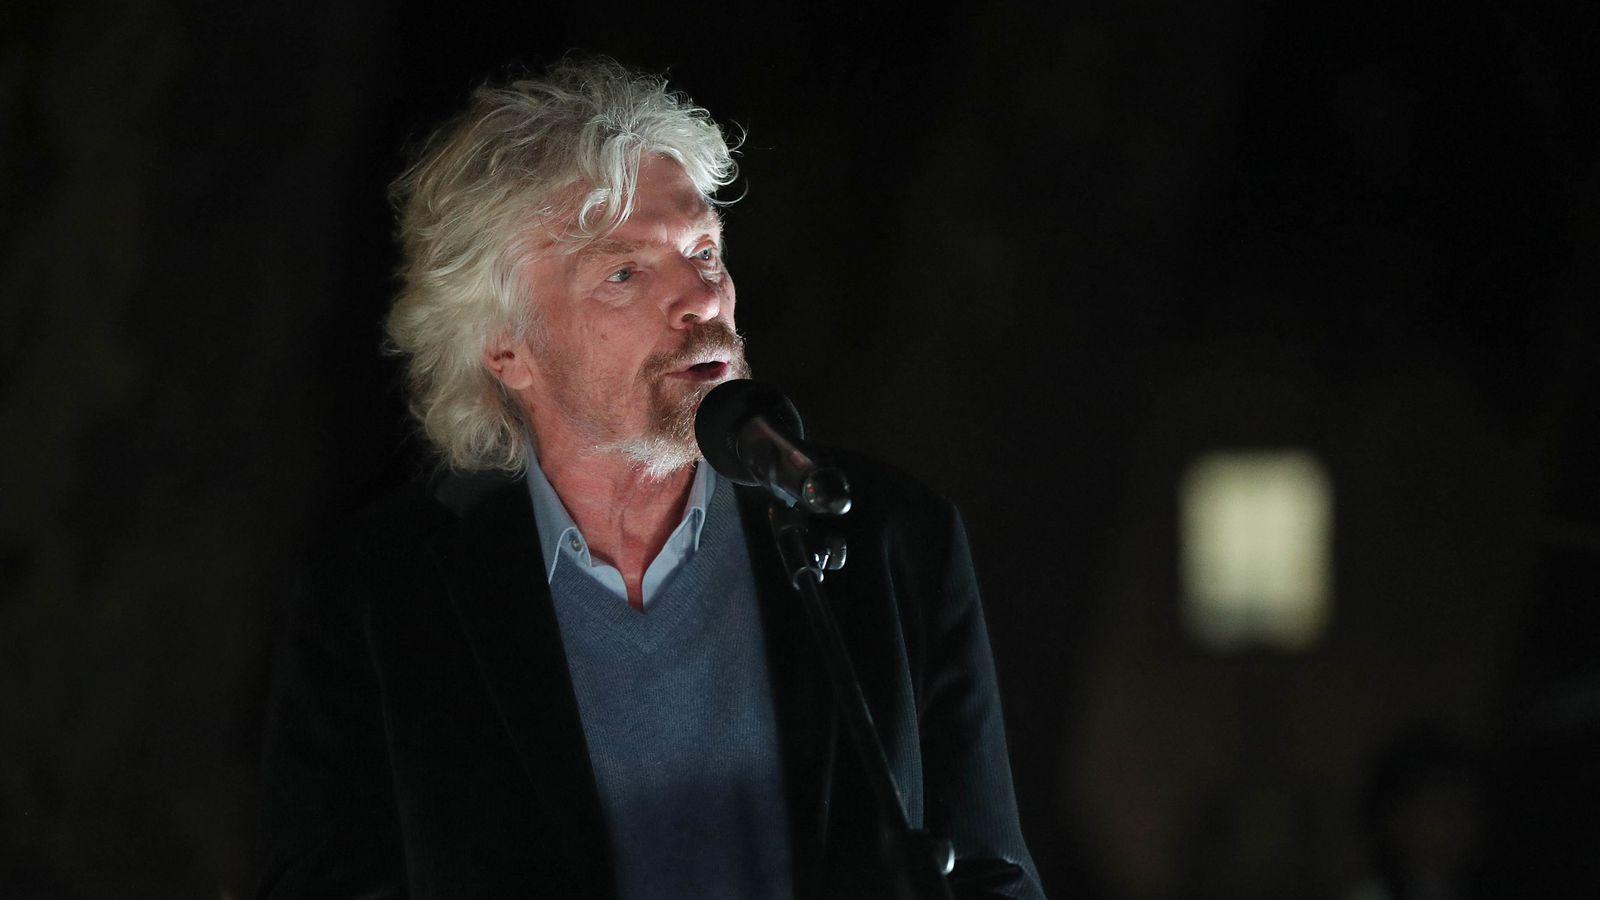 Sir Richard Branson responds to 'sex assault' claim | Ents ...